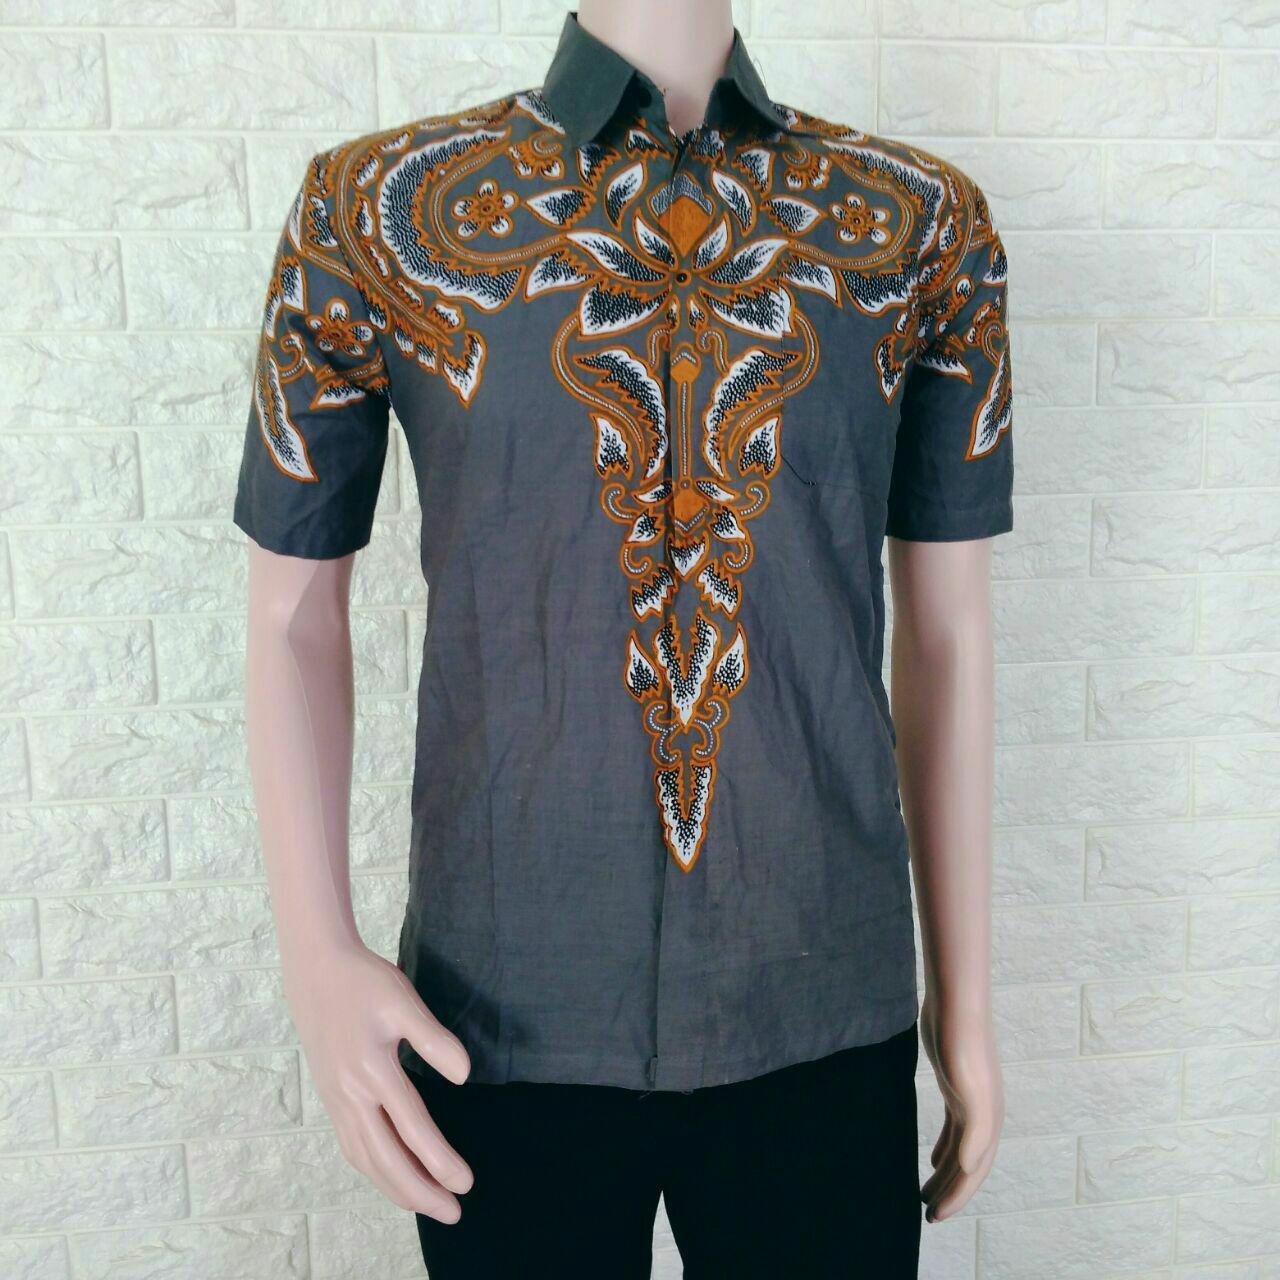 Kemeja Batik Kombinasi Kemeja Batik Pria Elegan Terbaru Keren Kemeja Batik  Hem Batik Hem Batik Pekalongan 0b87241f1e